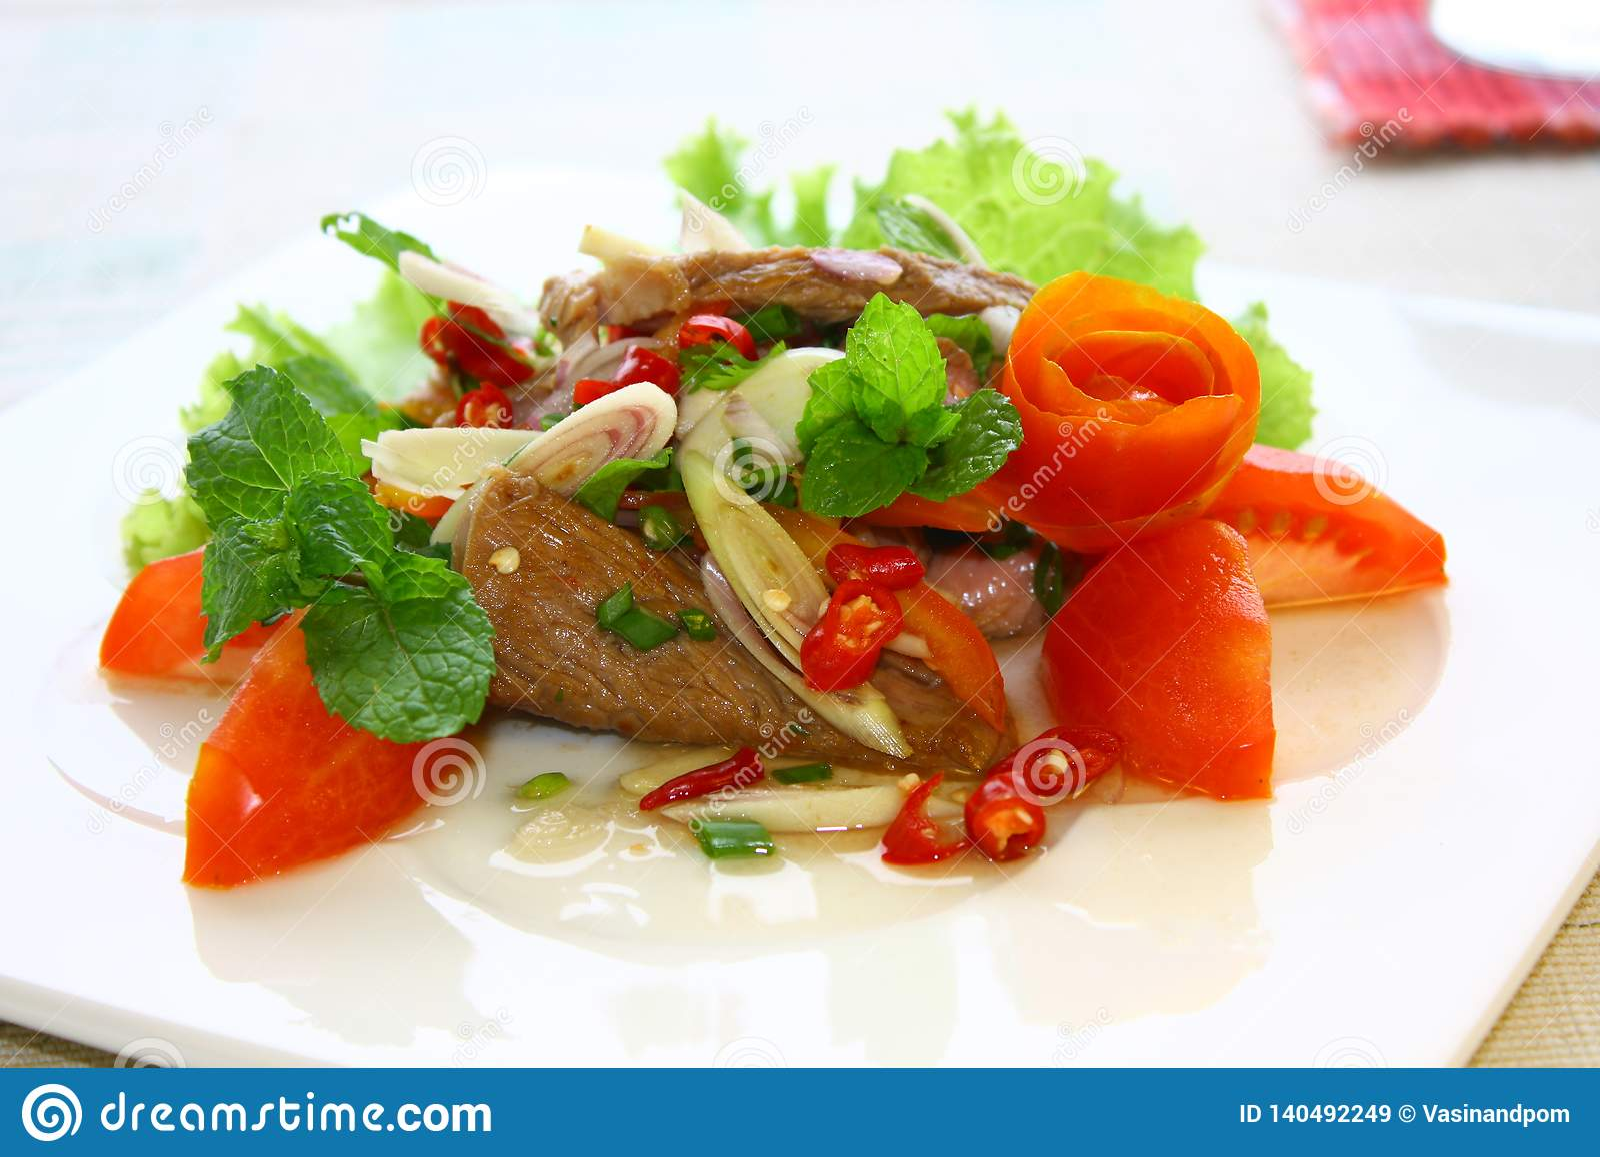 Fish cake, Thai style fish cake served with crispy basil leaf.